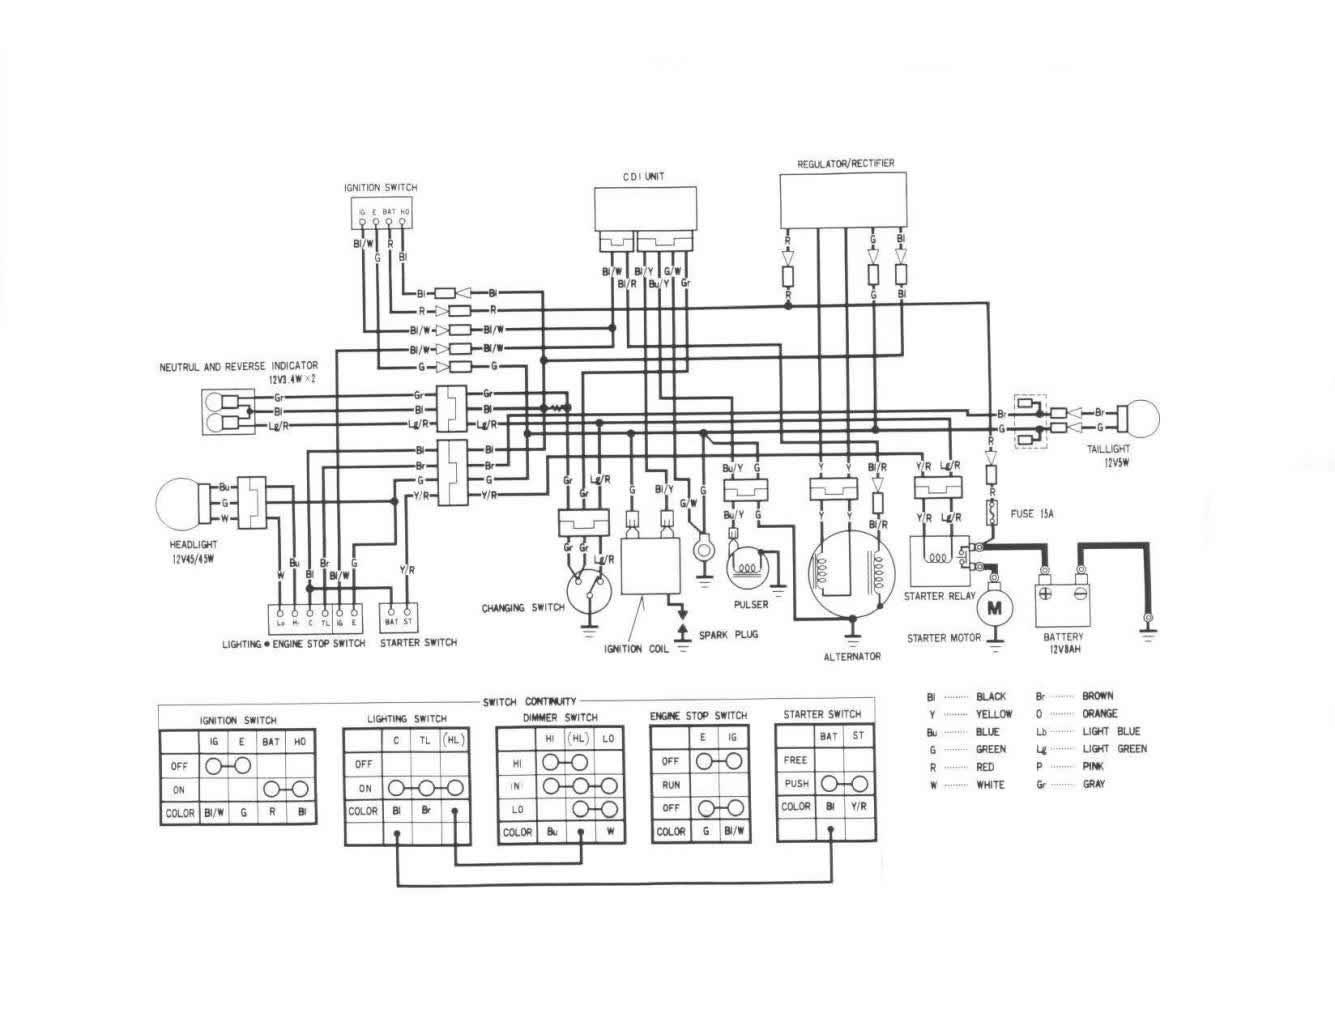 Watch furthermore 1993 Kawasaki Ninja Ex500 Wiring Diagram as well Kawasaki 3010 Mule Fuel Filter additionally Manuali Di Manutenzione Moto besides Replacing Ex500 Wiring Harness. on 2005 kawasaki ninja 250 wiring diagram